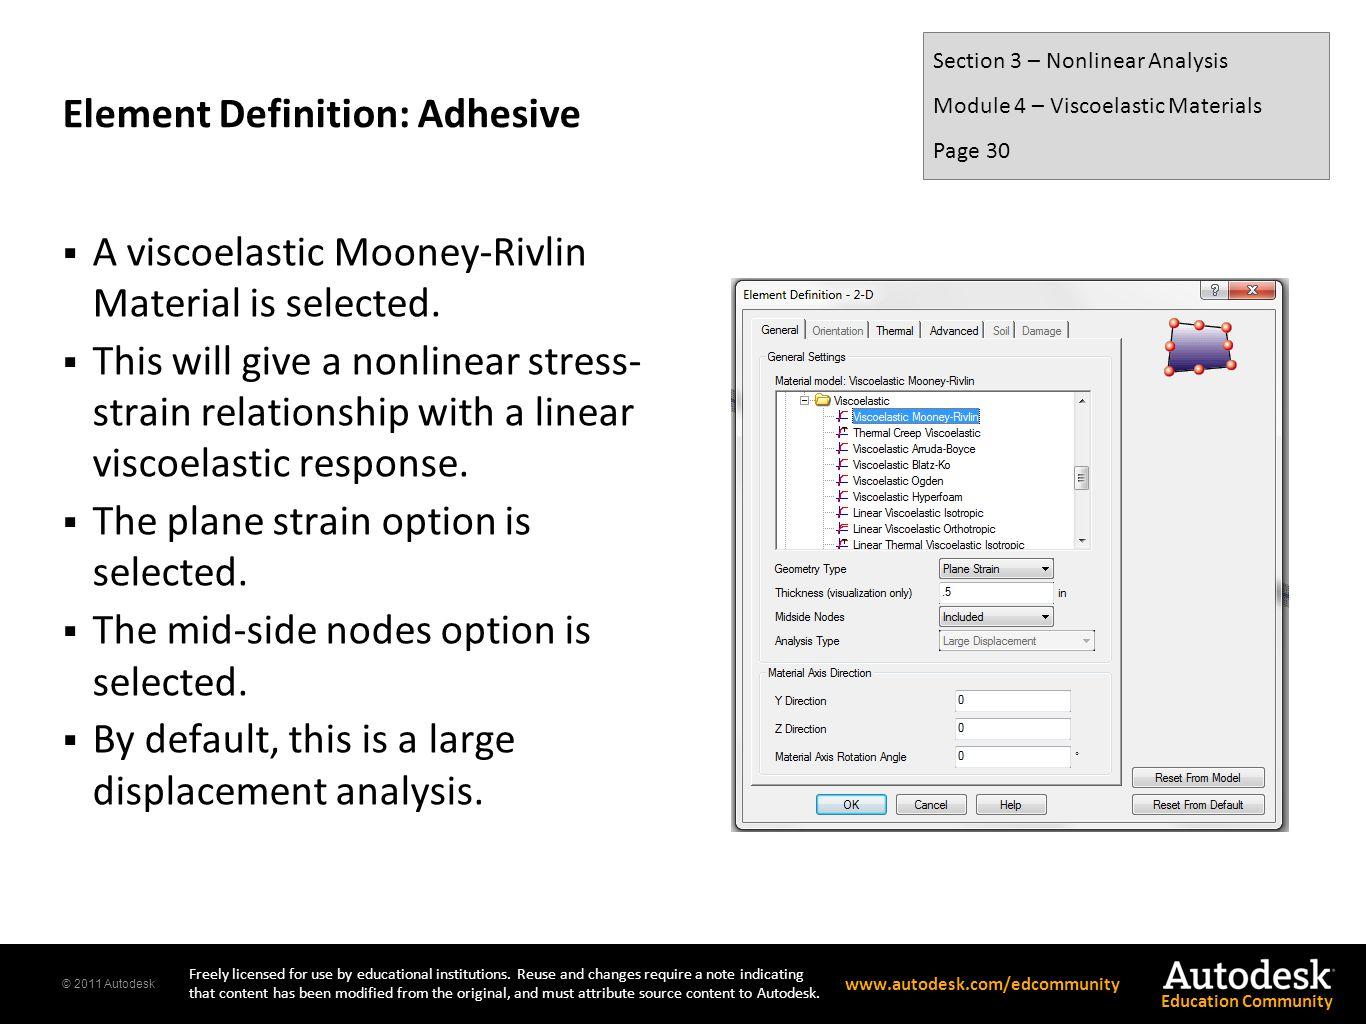 Element Definition: Adhesive